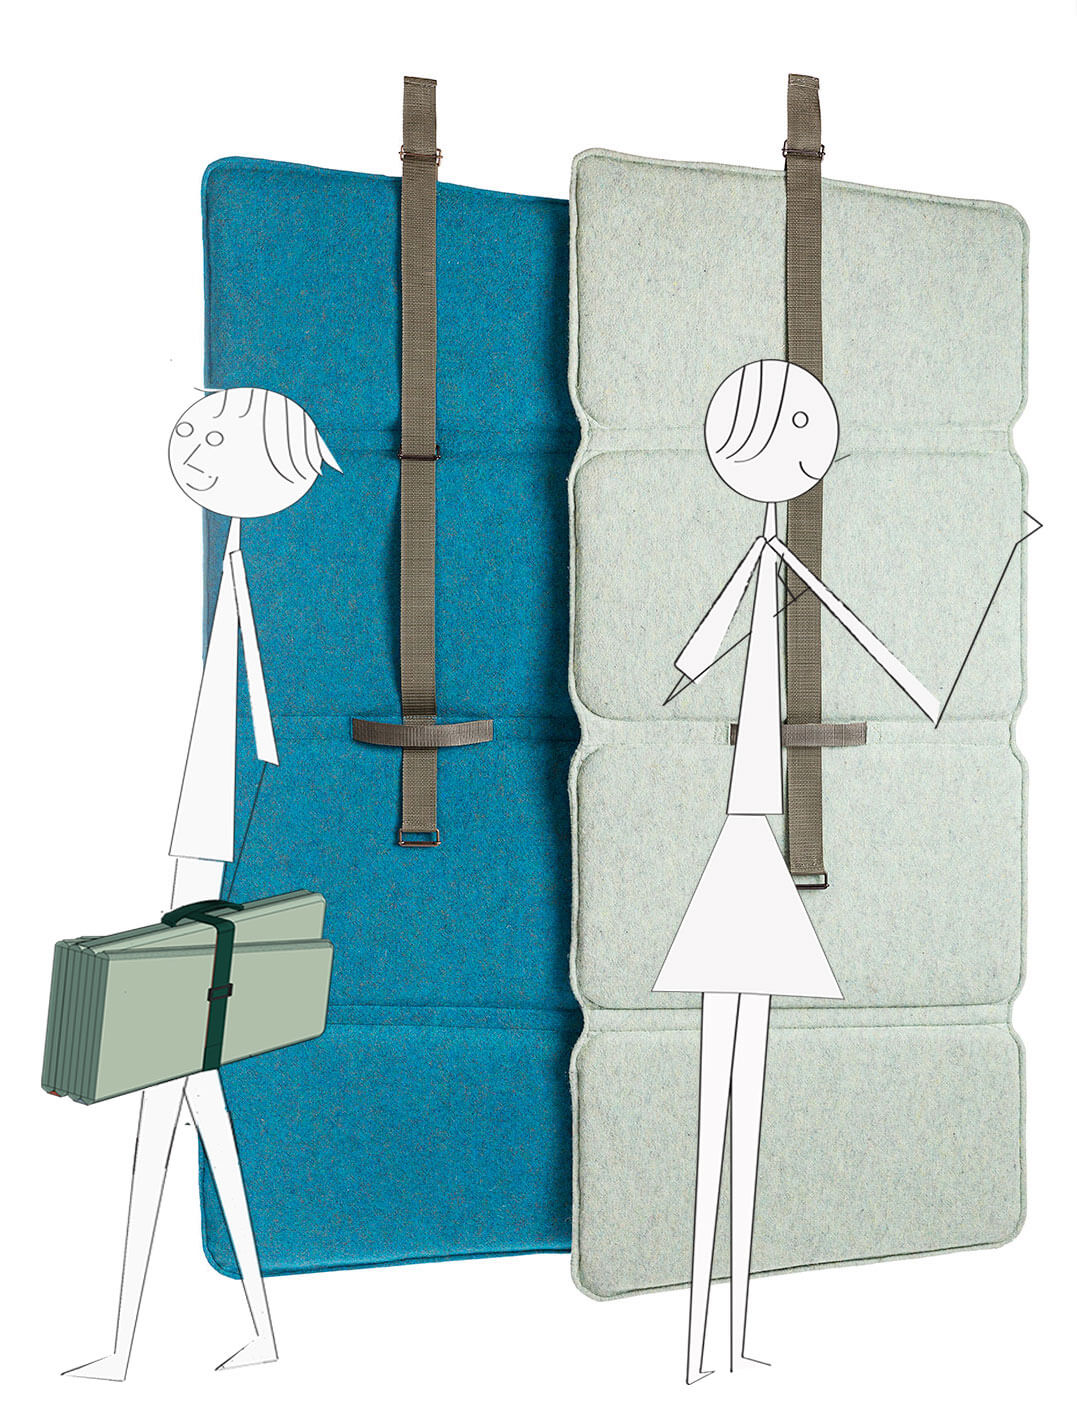 Acoustic desk-screen, room-divider, wall-panel. Optimal comfort for flex working